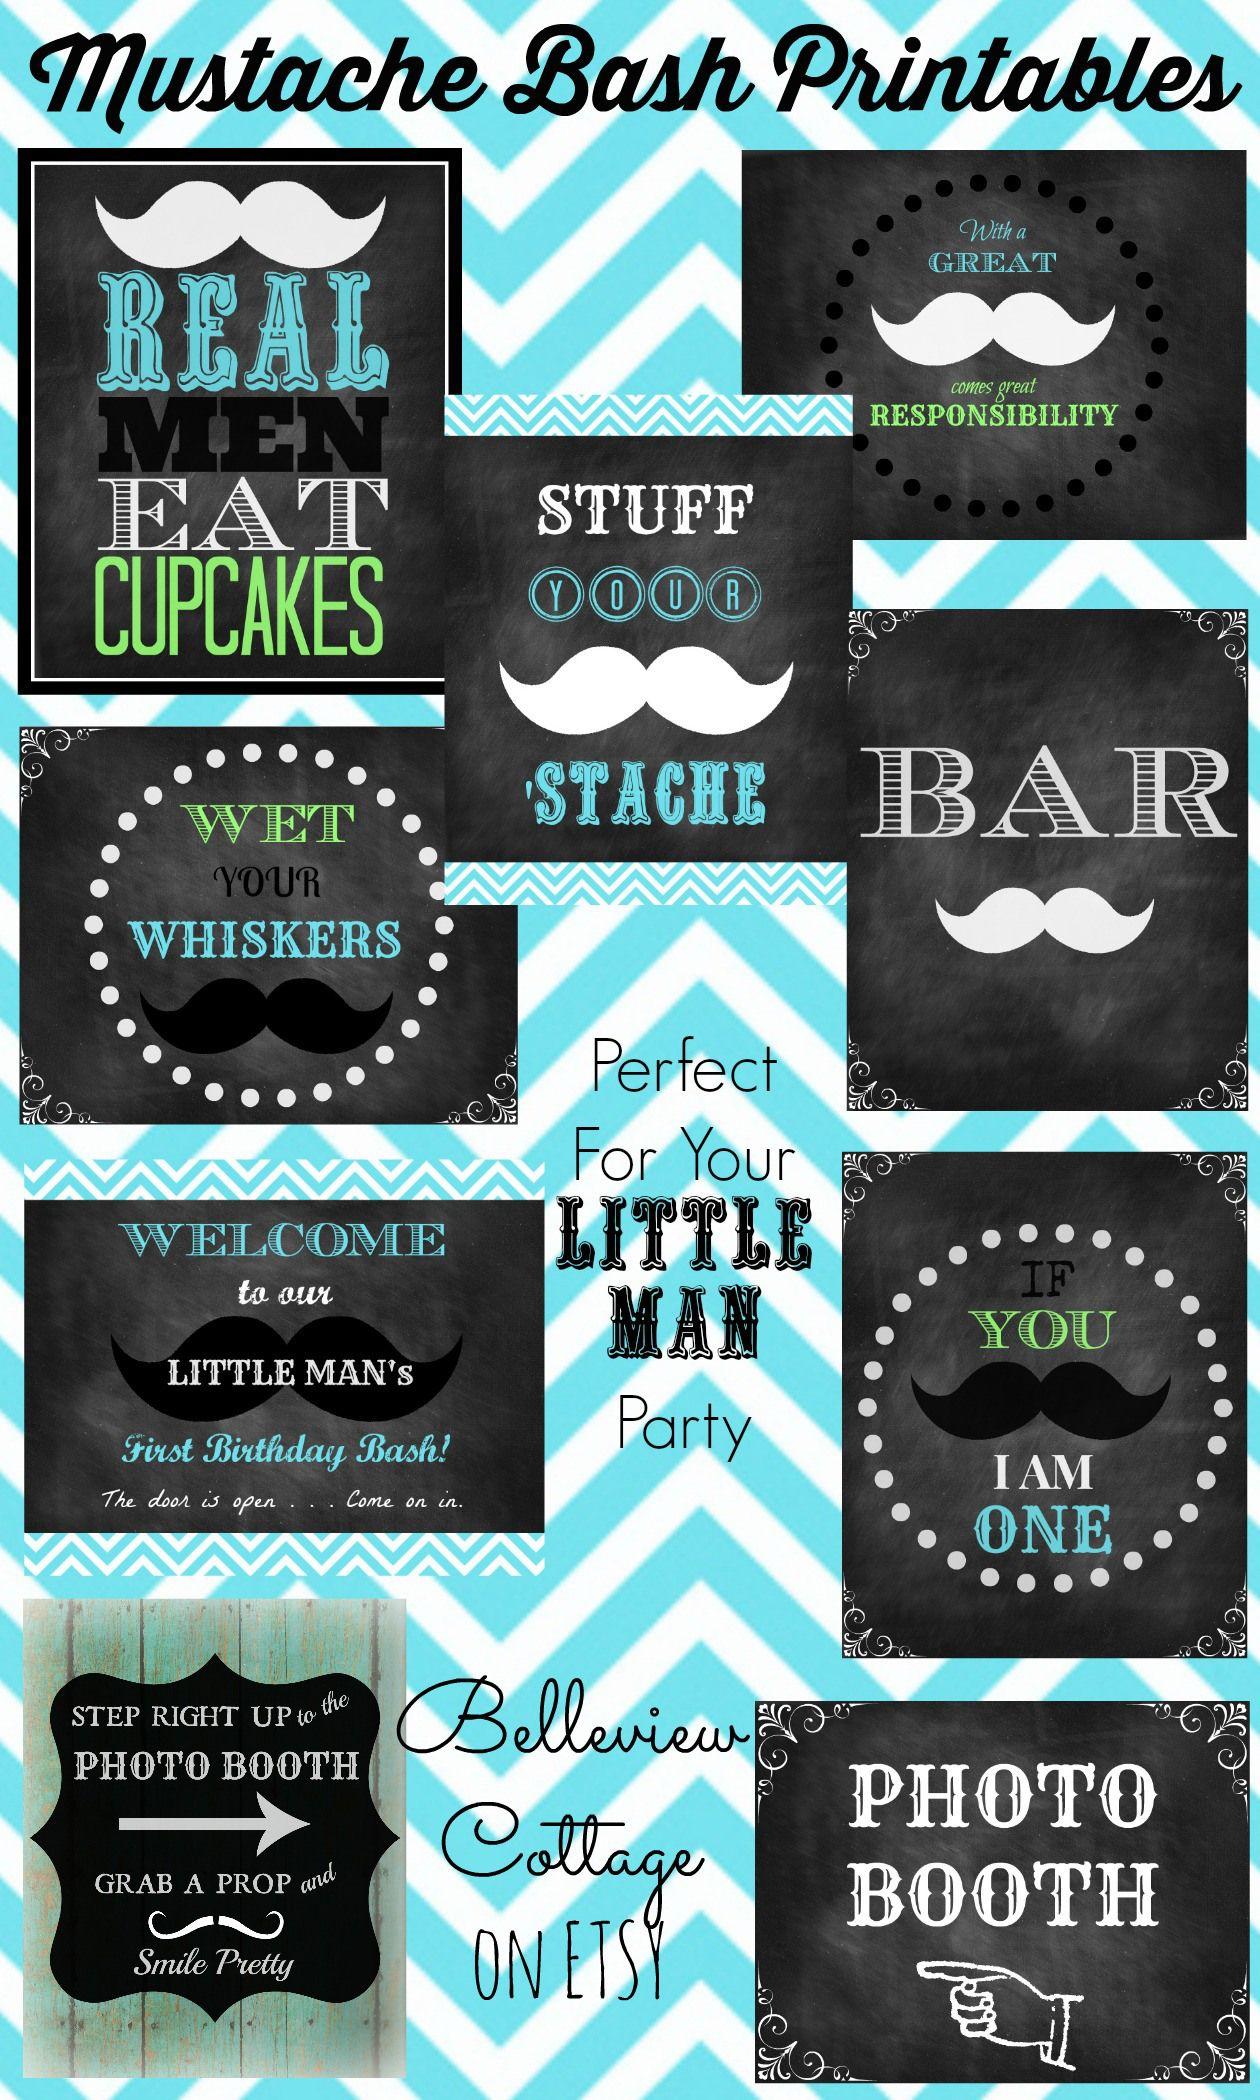 Little Man Milestone Board 1st First Birthday Design Gentleman Moustache Green Blue Boy/'s Party Decoration Milestone Chart PRINTABLE